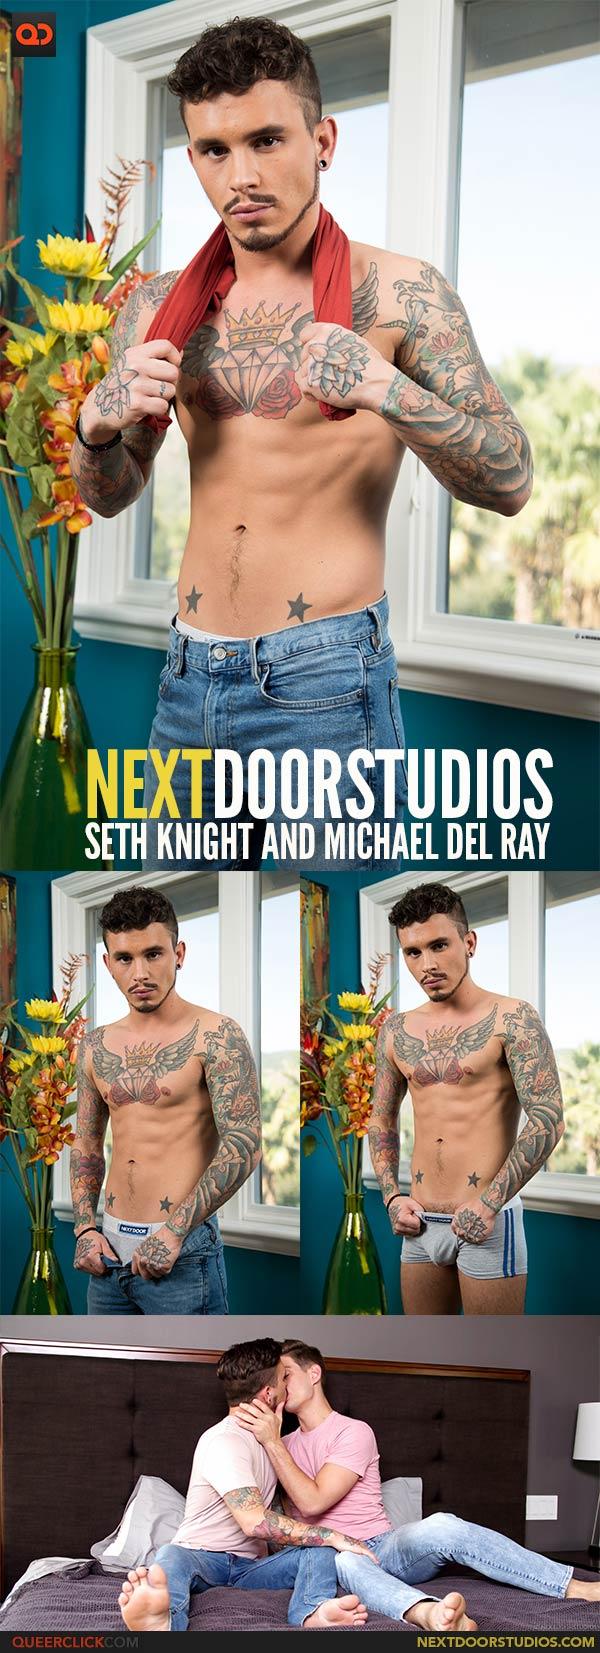 Next Door Studios: Seth Knight and Michael Del Ray